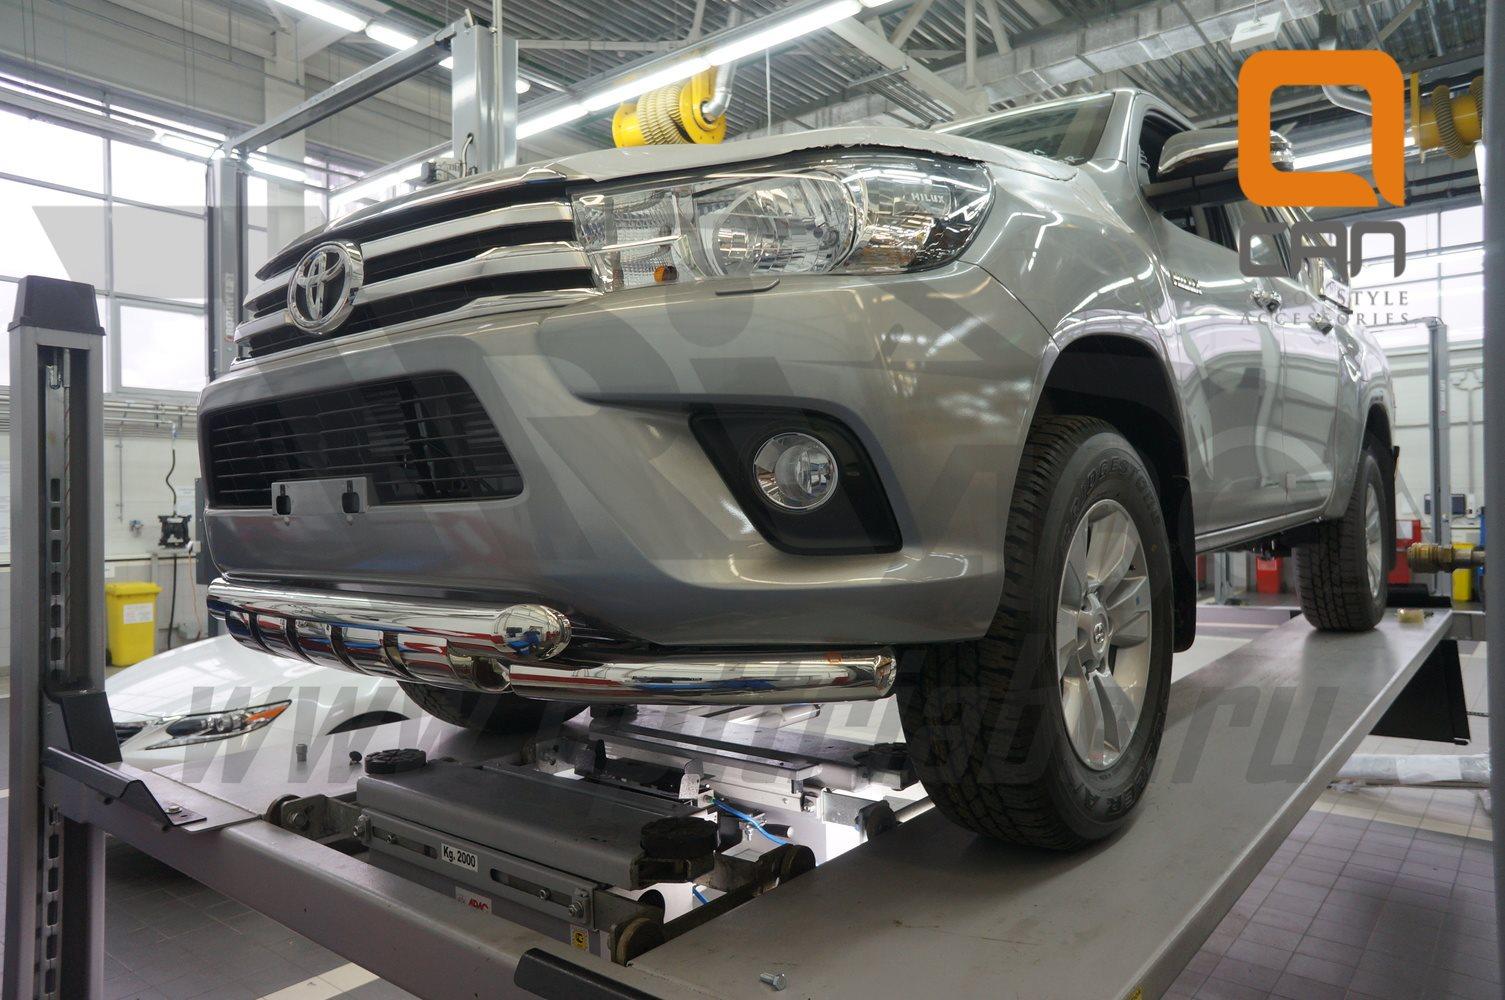 Защита переднего бампера Toyota Hilux (2015-) (двойная Shark) d76 76 2